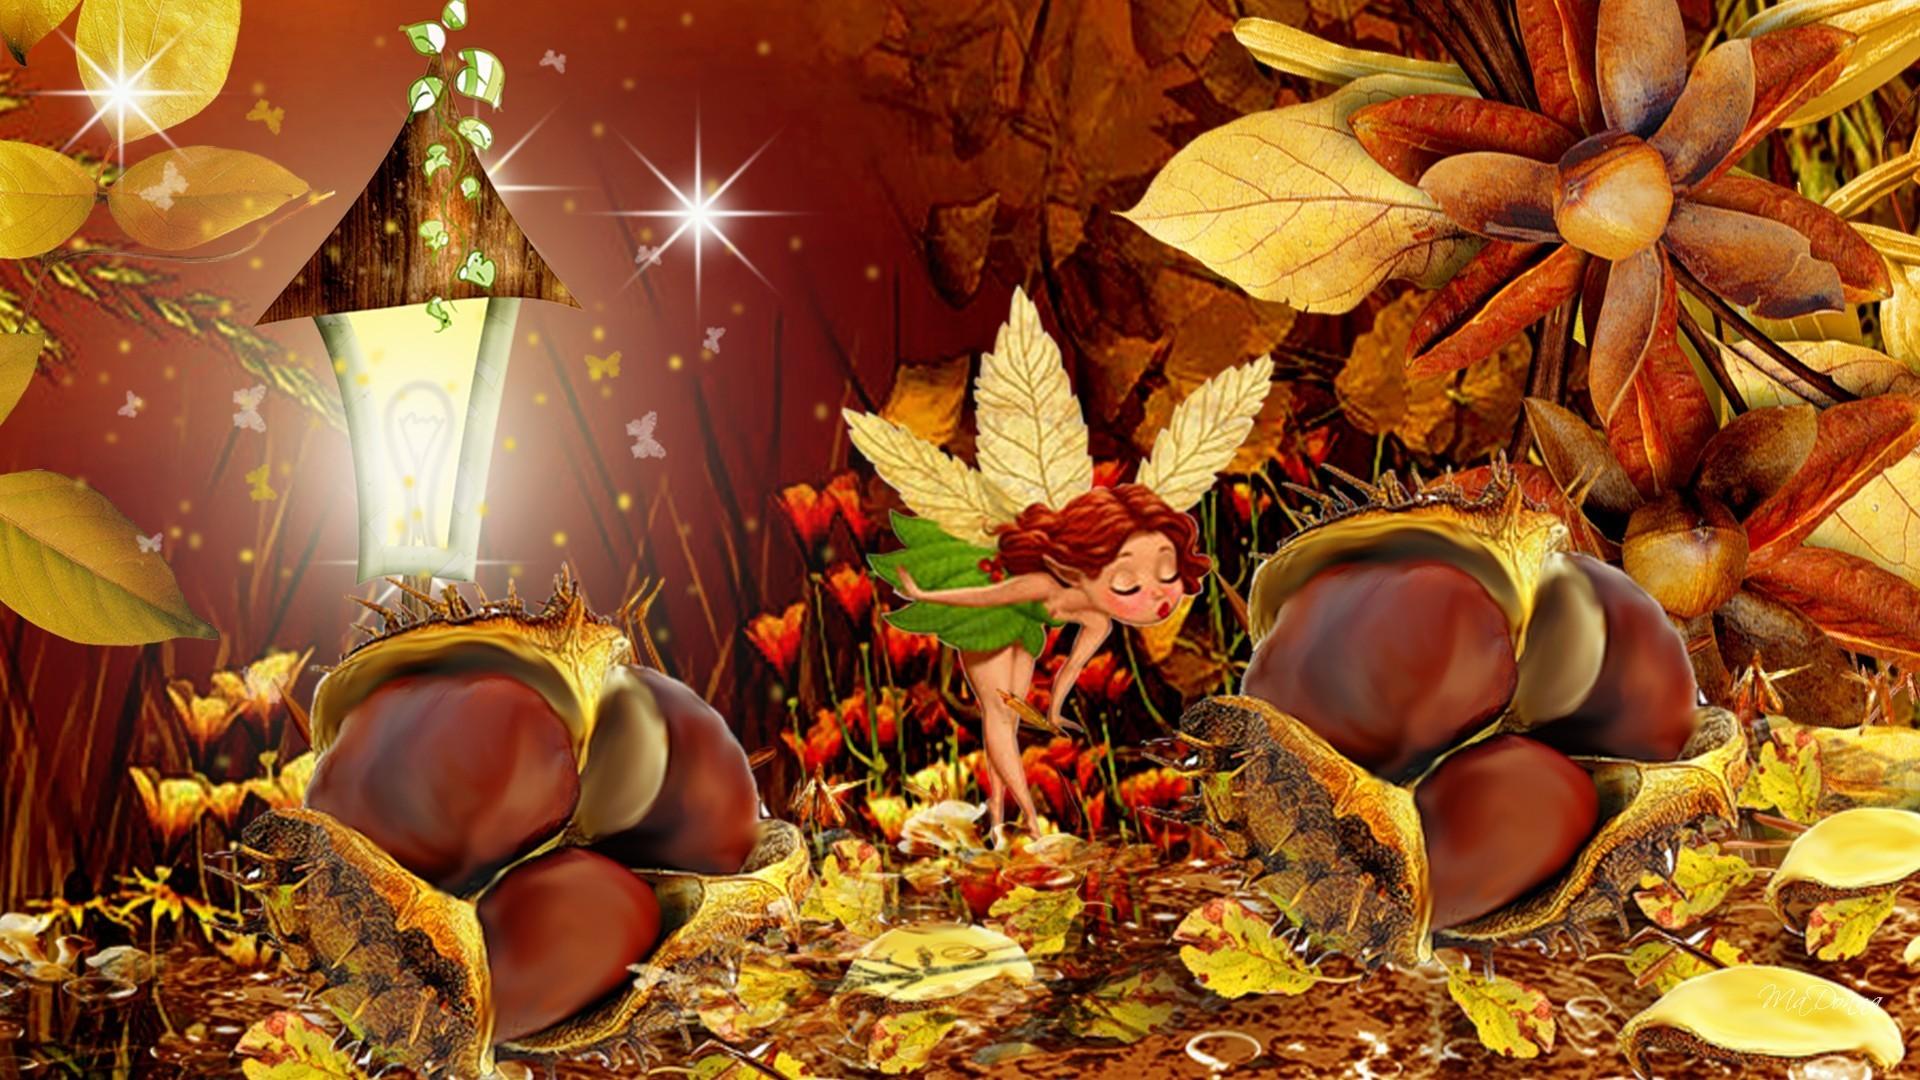 January 6, 2017 – Chestnuts Light Fairy Fall Fantasy Flowers Stars Fancy  Leaves Autumn Nature